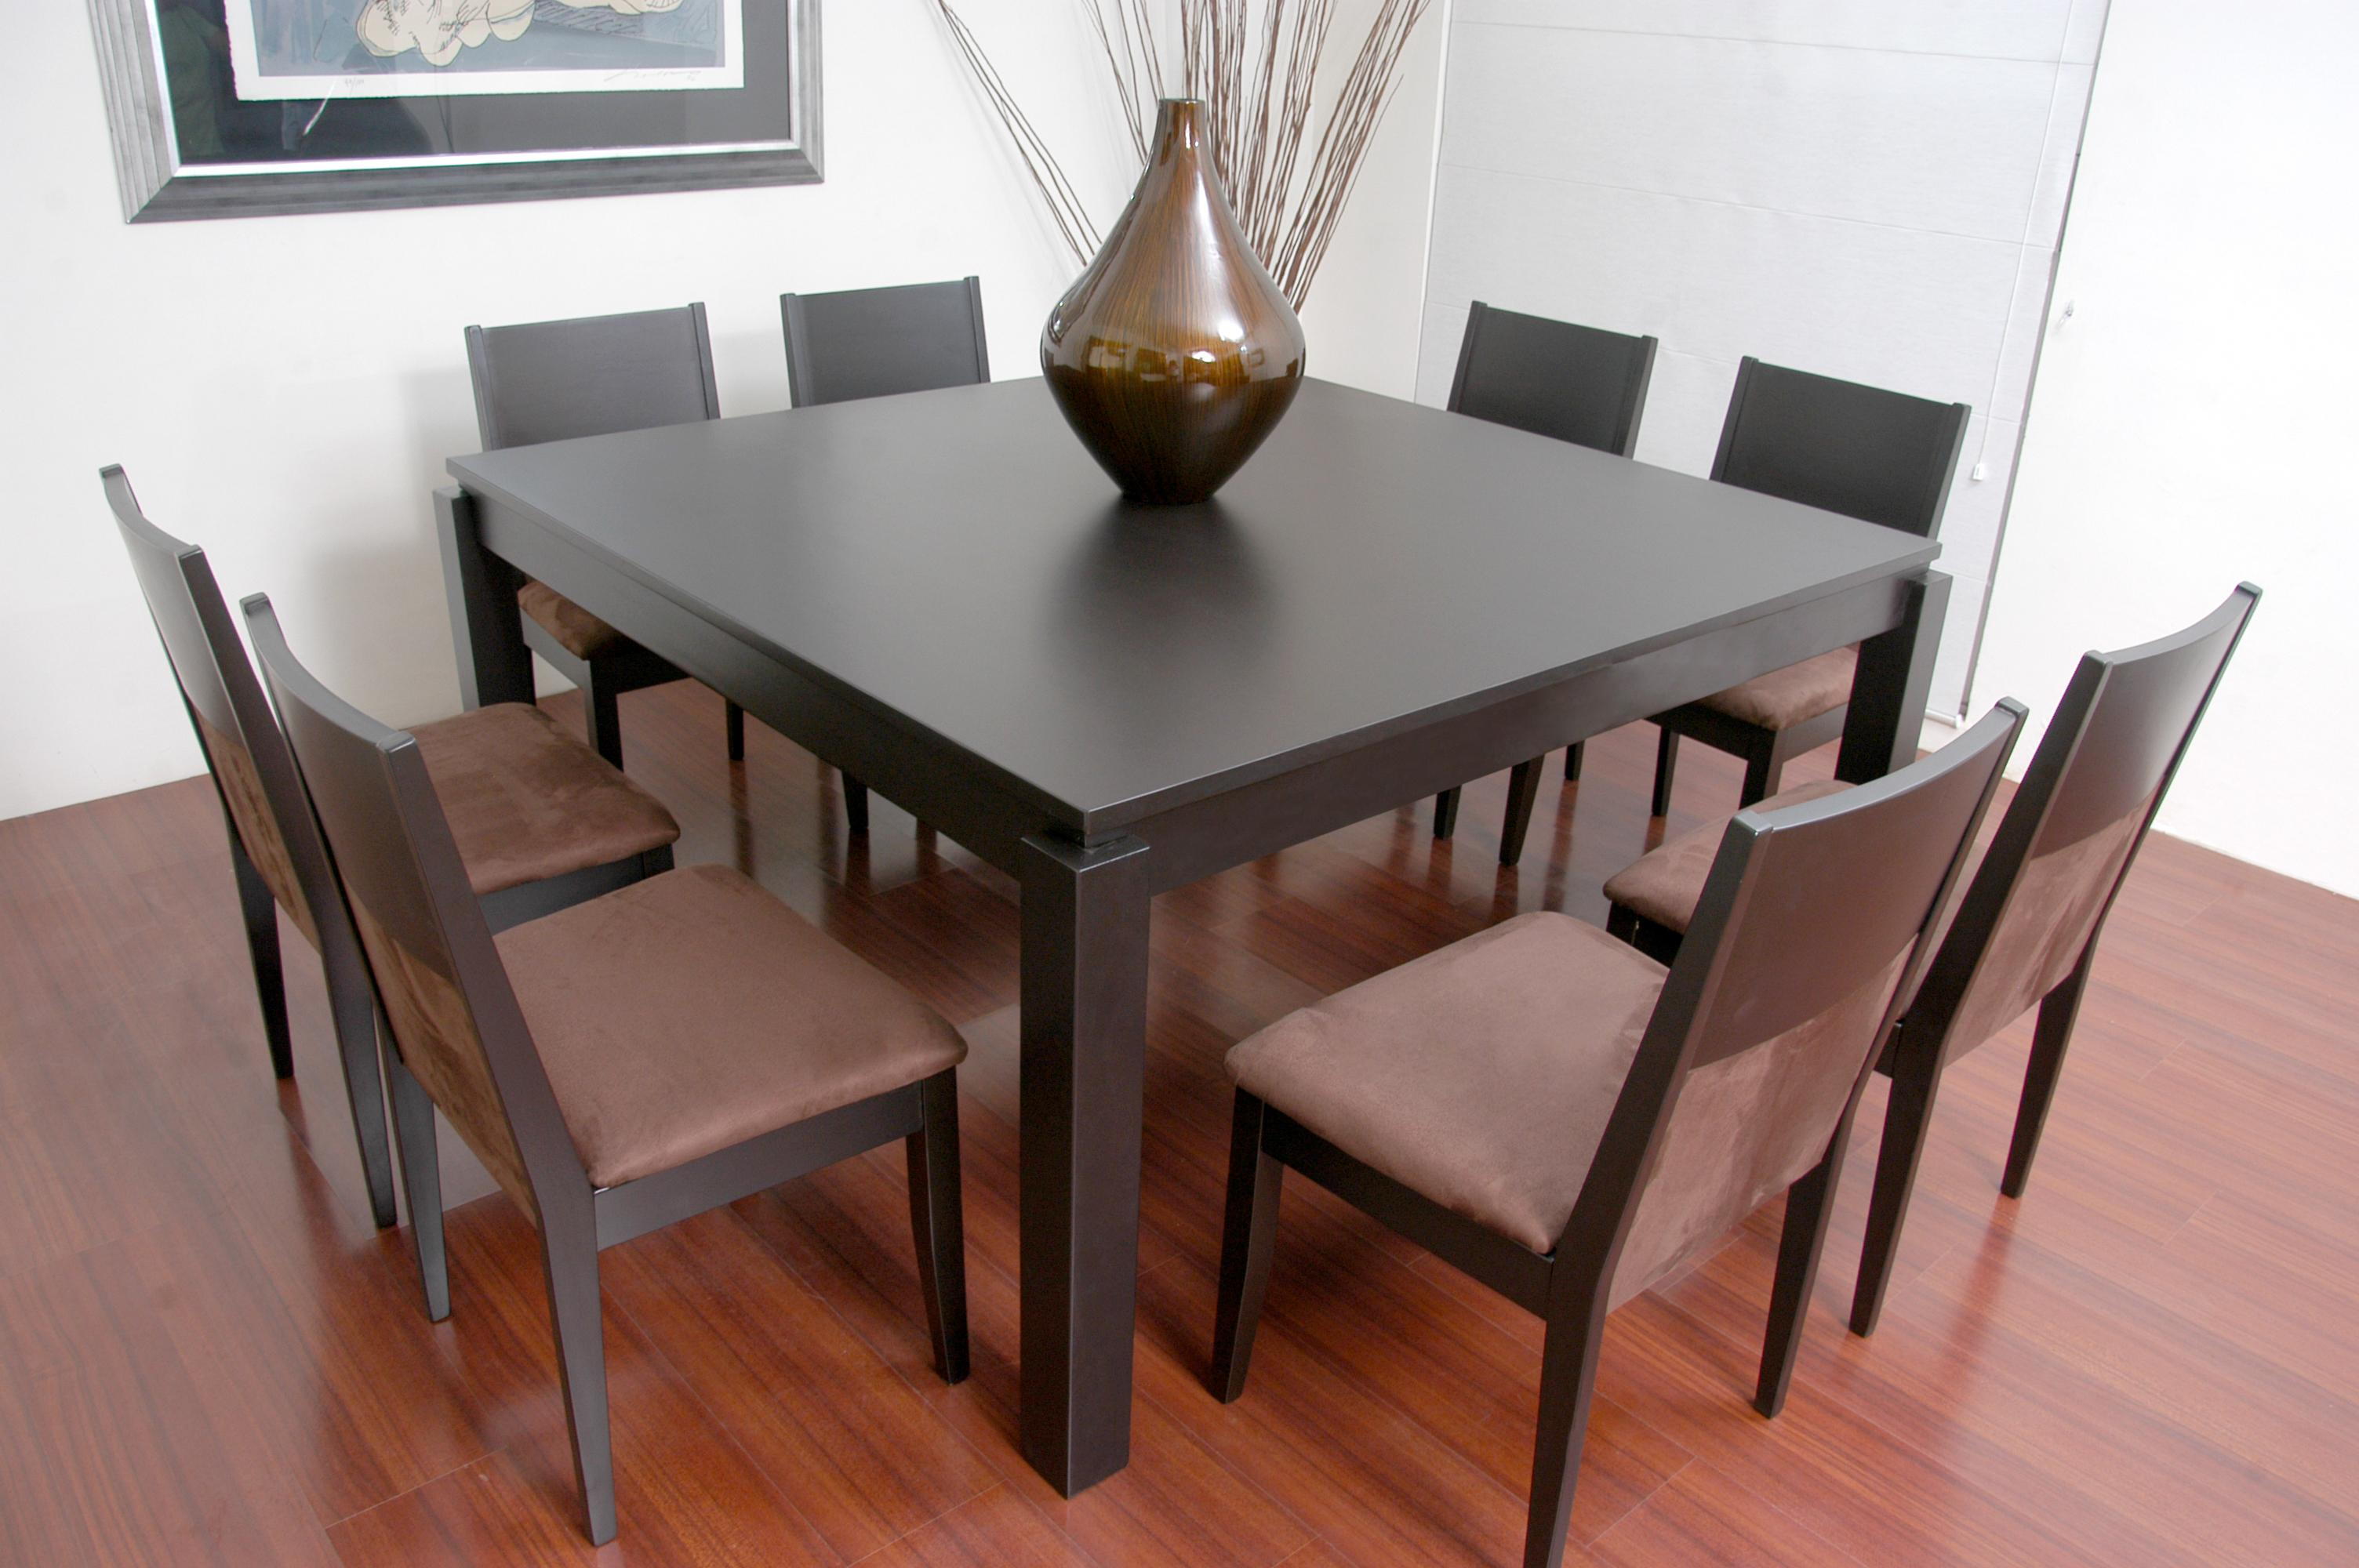 Antecomedor siena for Comedor 8 sillas madera